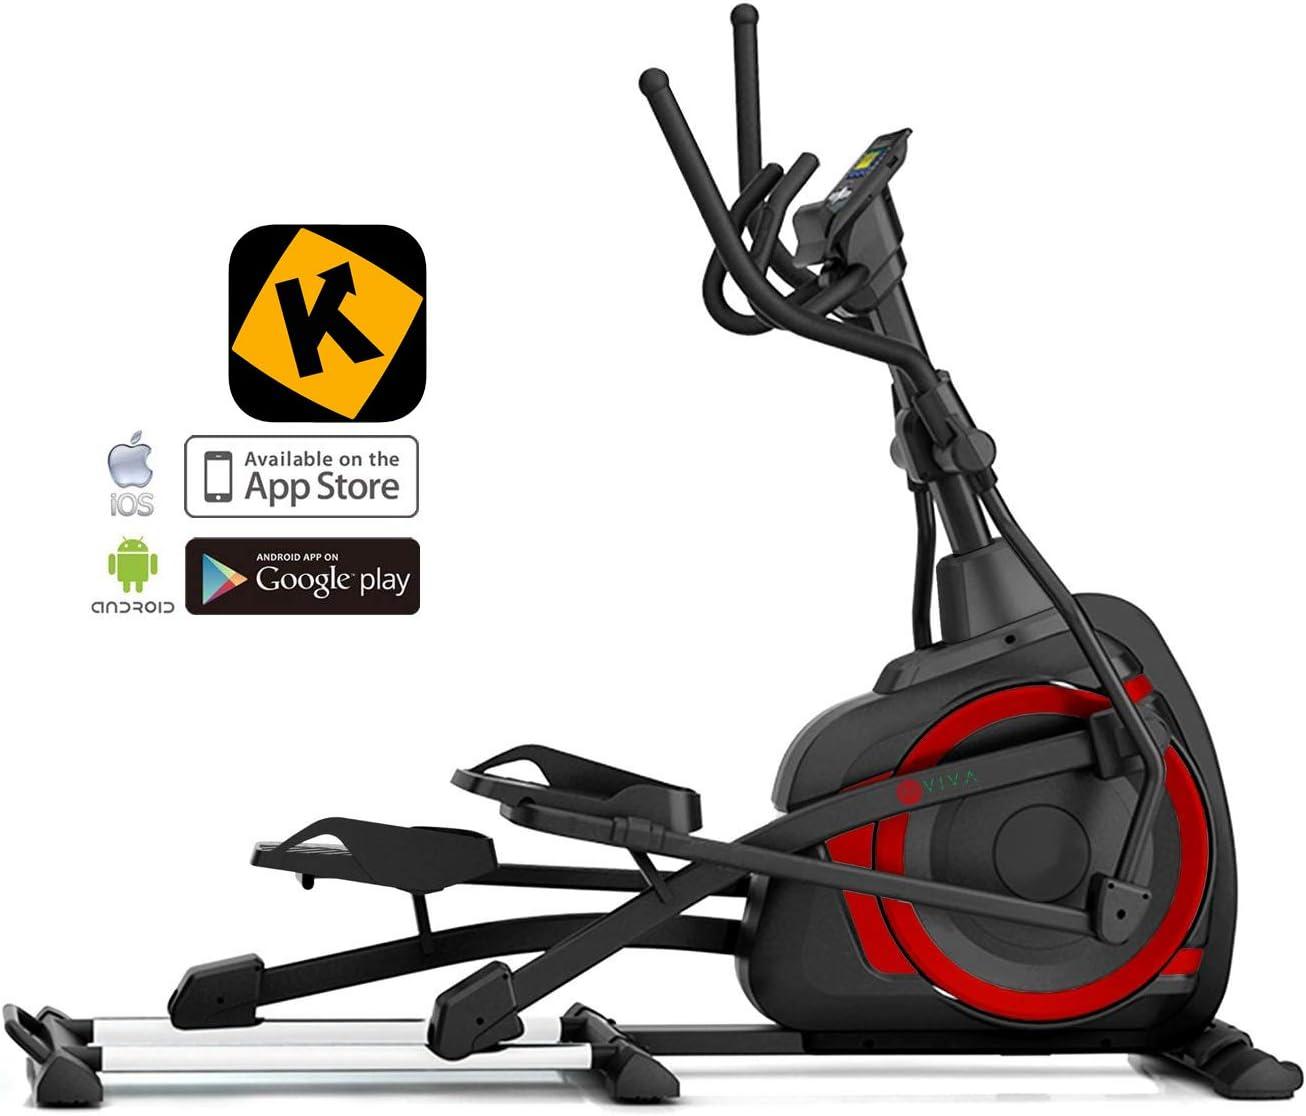 AsVIVA E4 Pro Crosstrainer